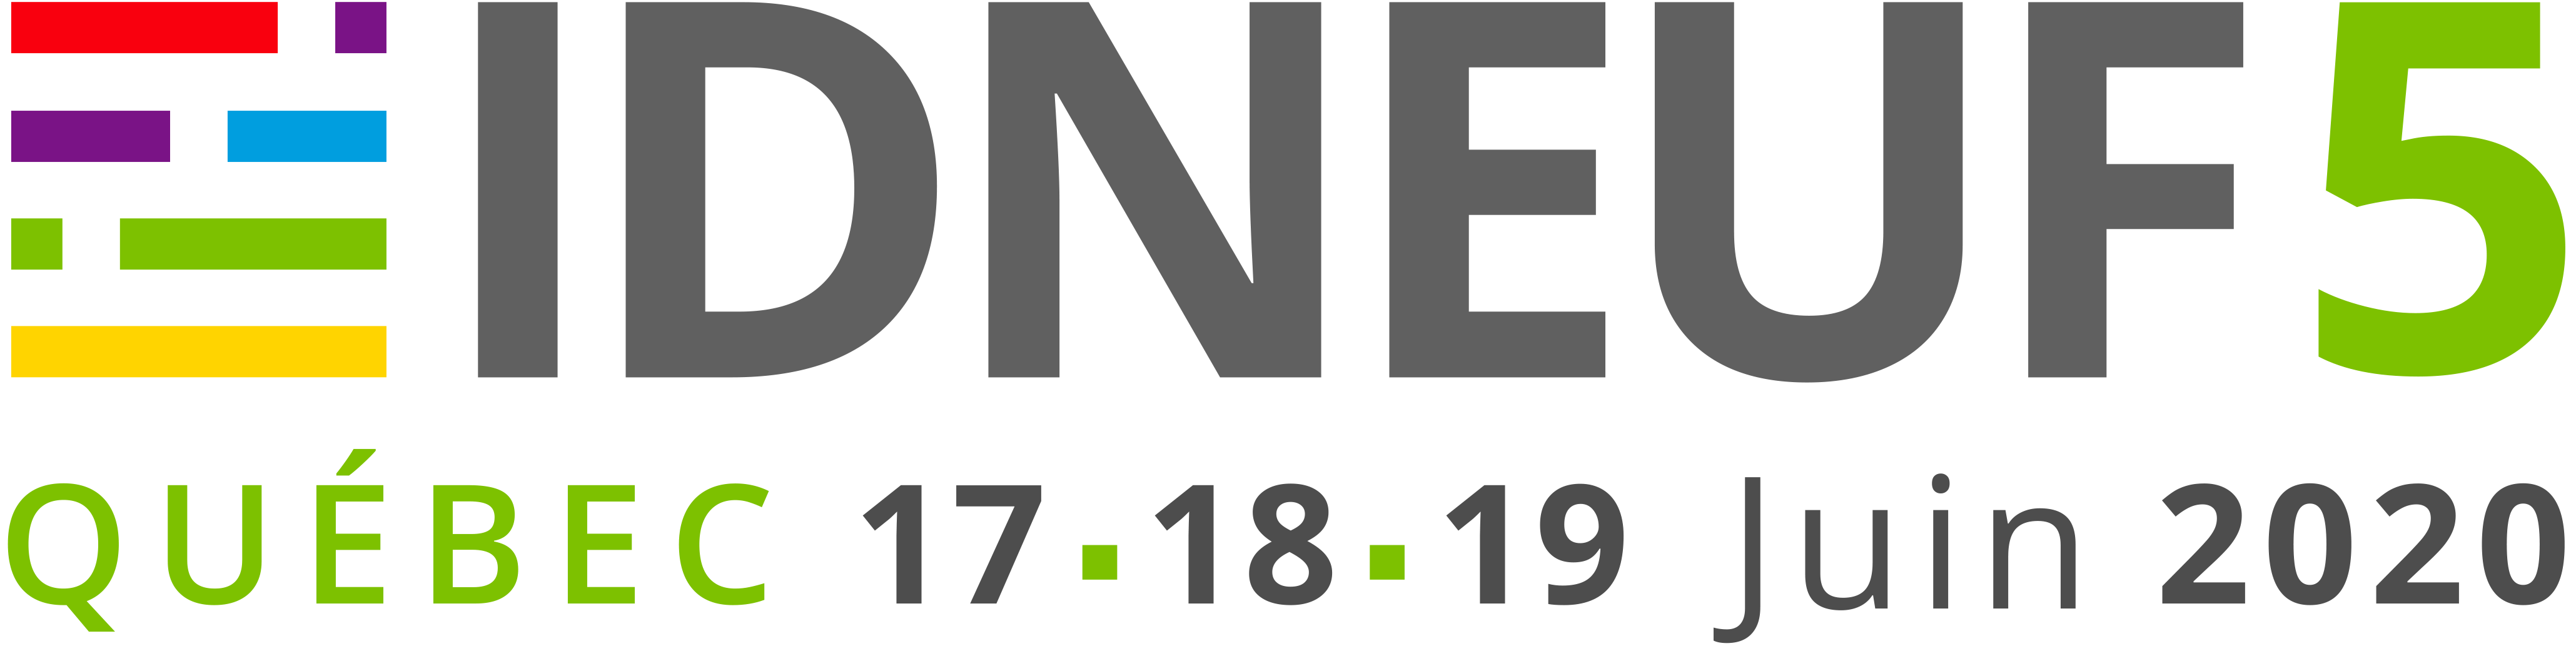 IDNEUF5 – Québec, Canada – du 17 au 19 juin 2020